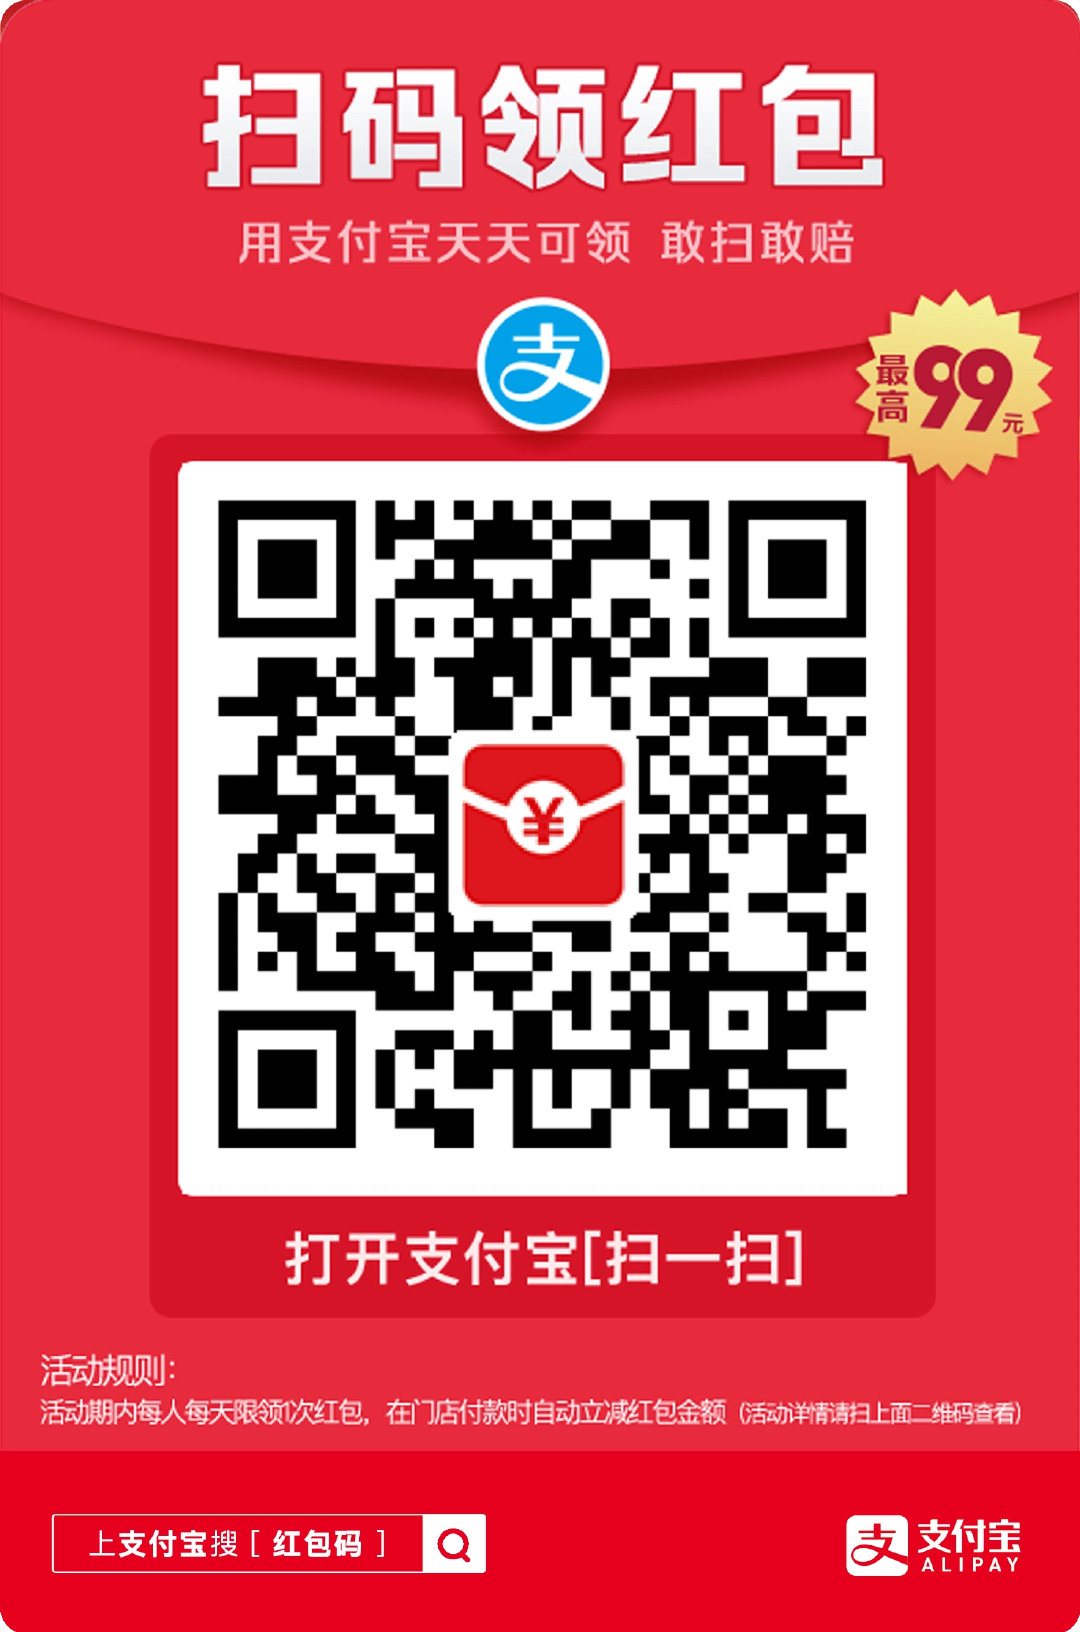 nur kirguzguch维吾尔语输入法手机版 app 图4